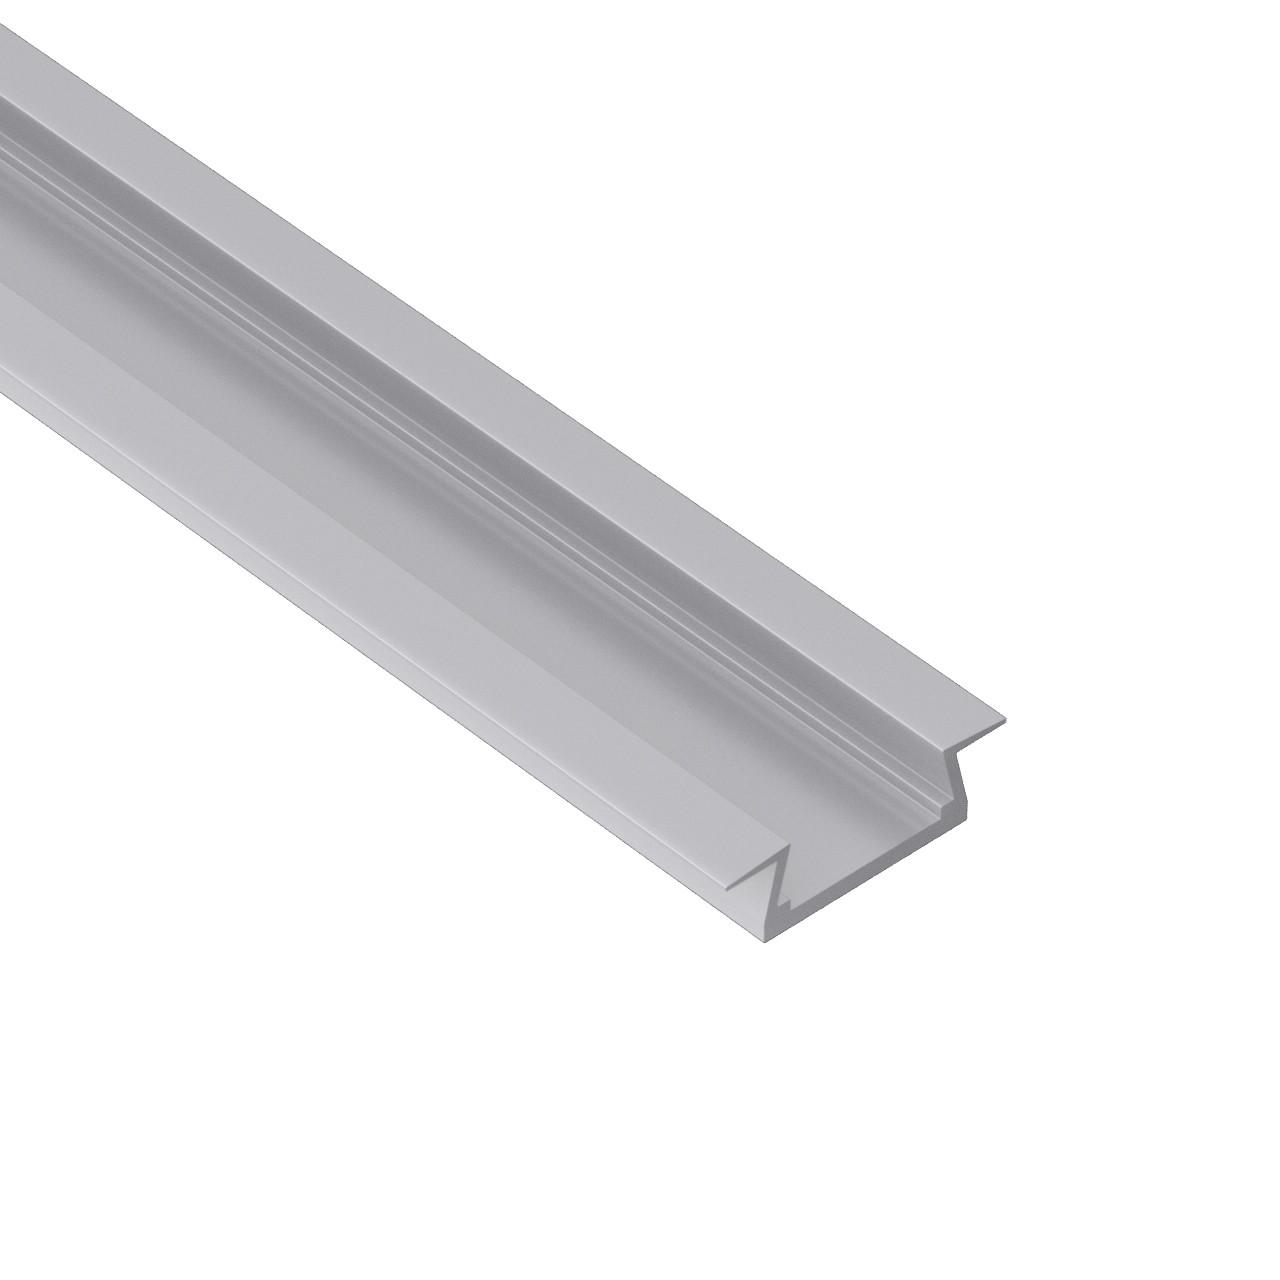 AR5 Super slim Aluminum Extrusion with Wings 22x6mm